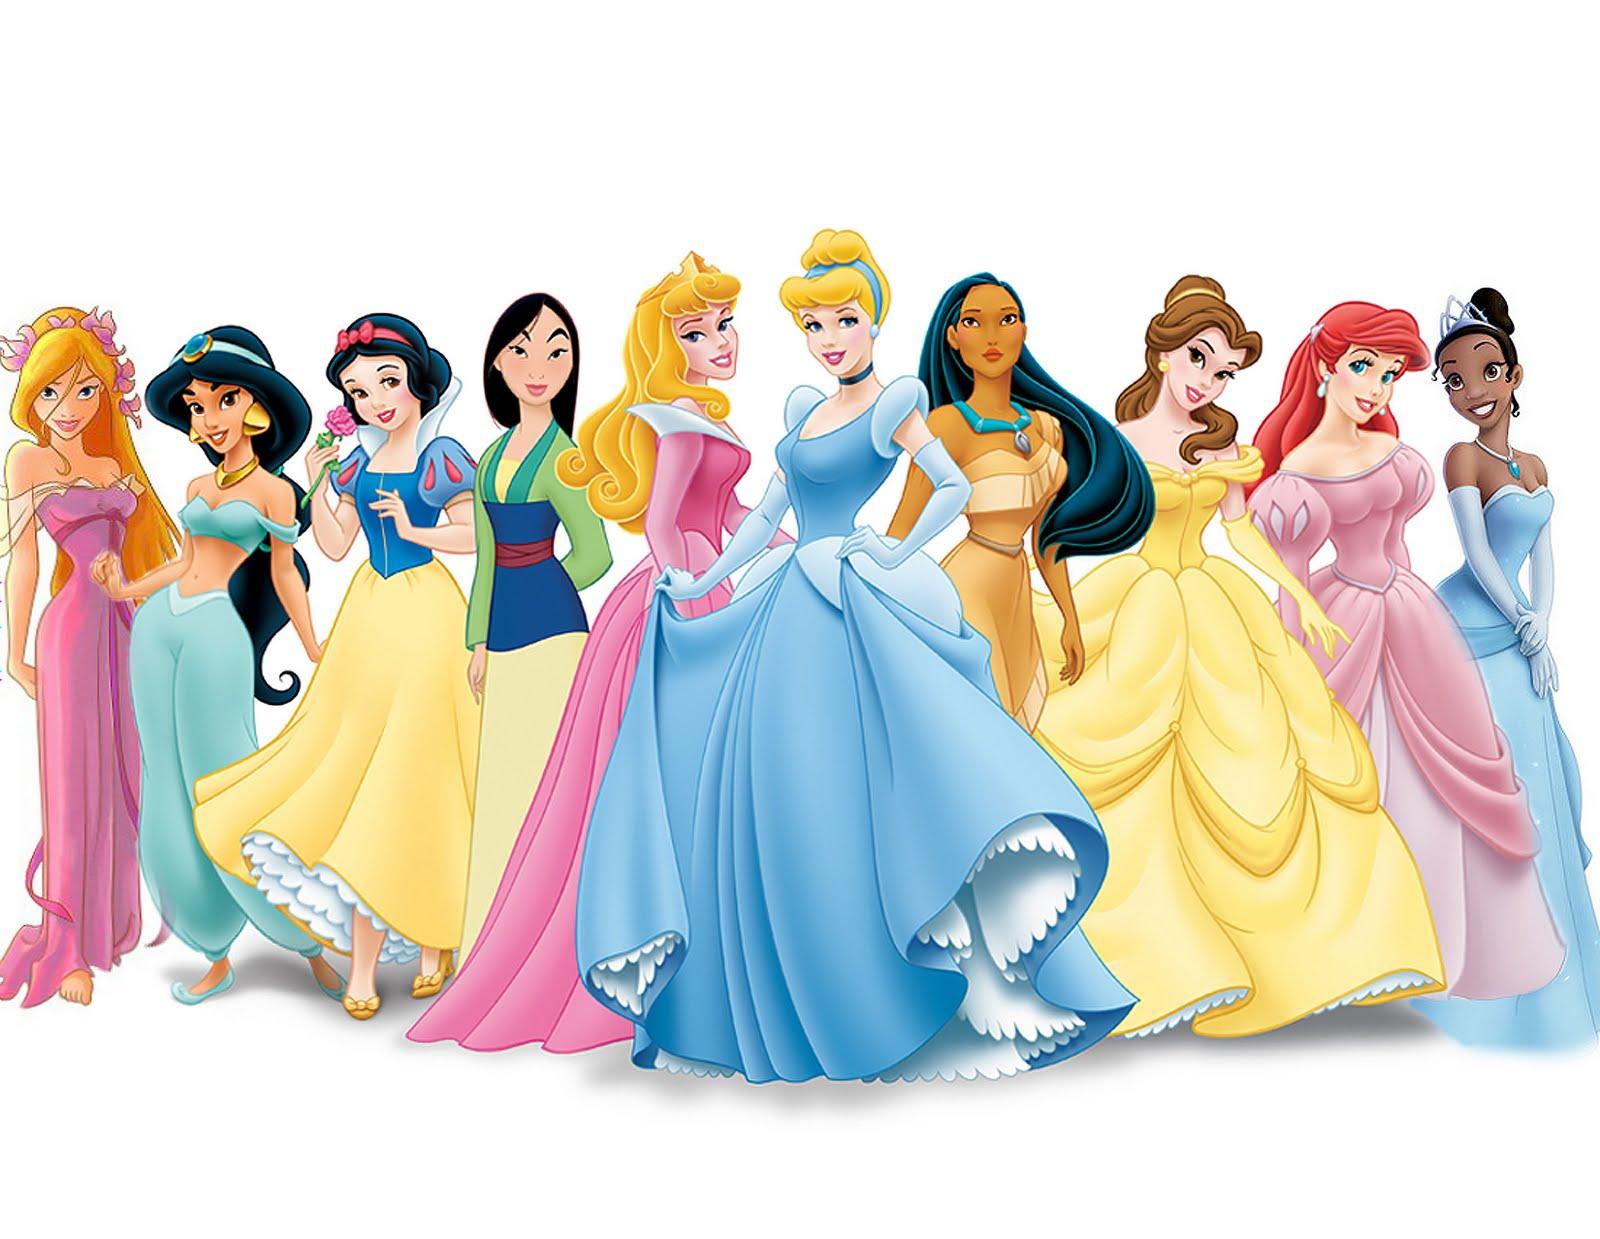 Disney Princesses Wallpaper Disney Desktop Wallpaper 1600x1239